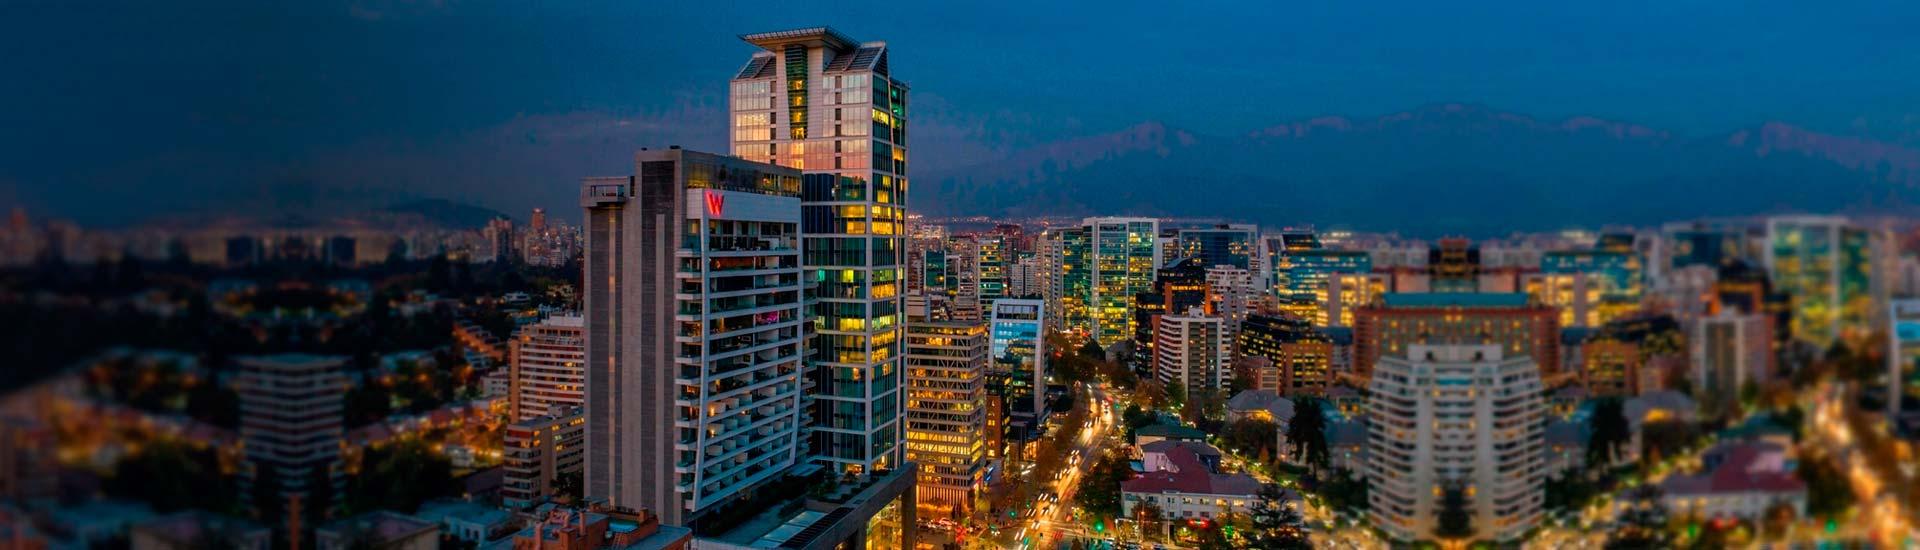 oferta hotel w santiago